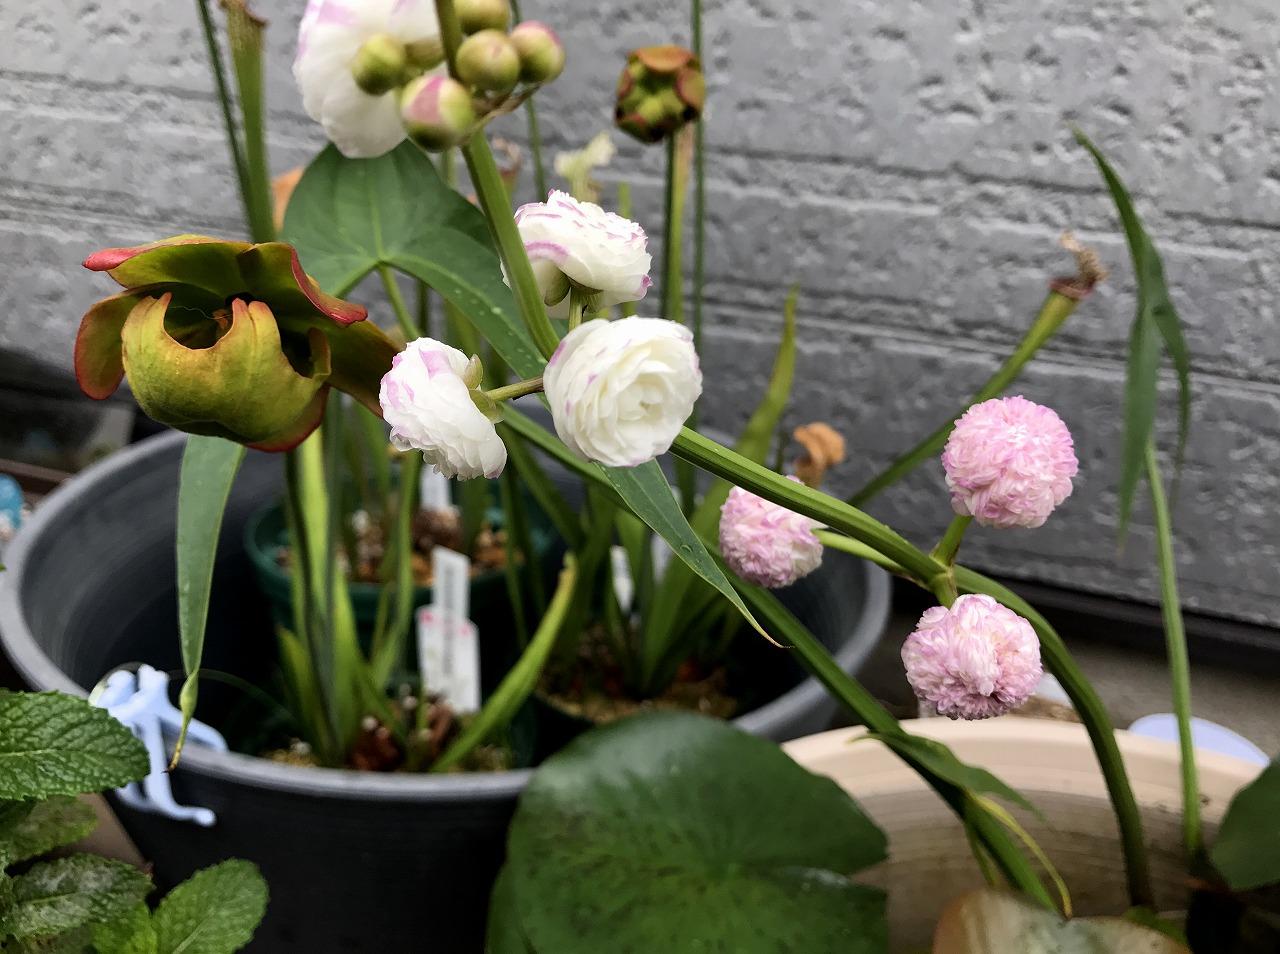 20170628-Sagttaria_sagittifolia-I01.jpg